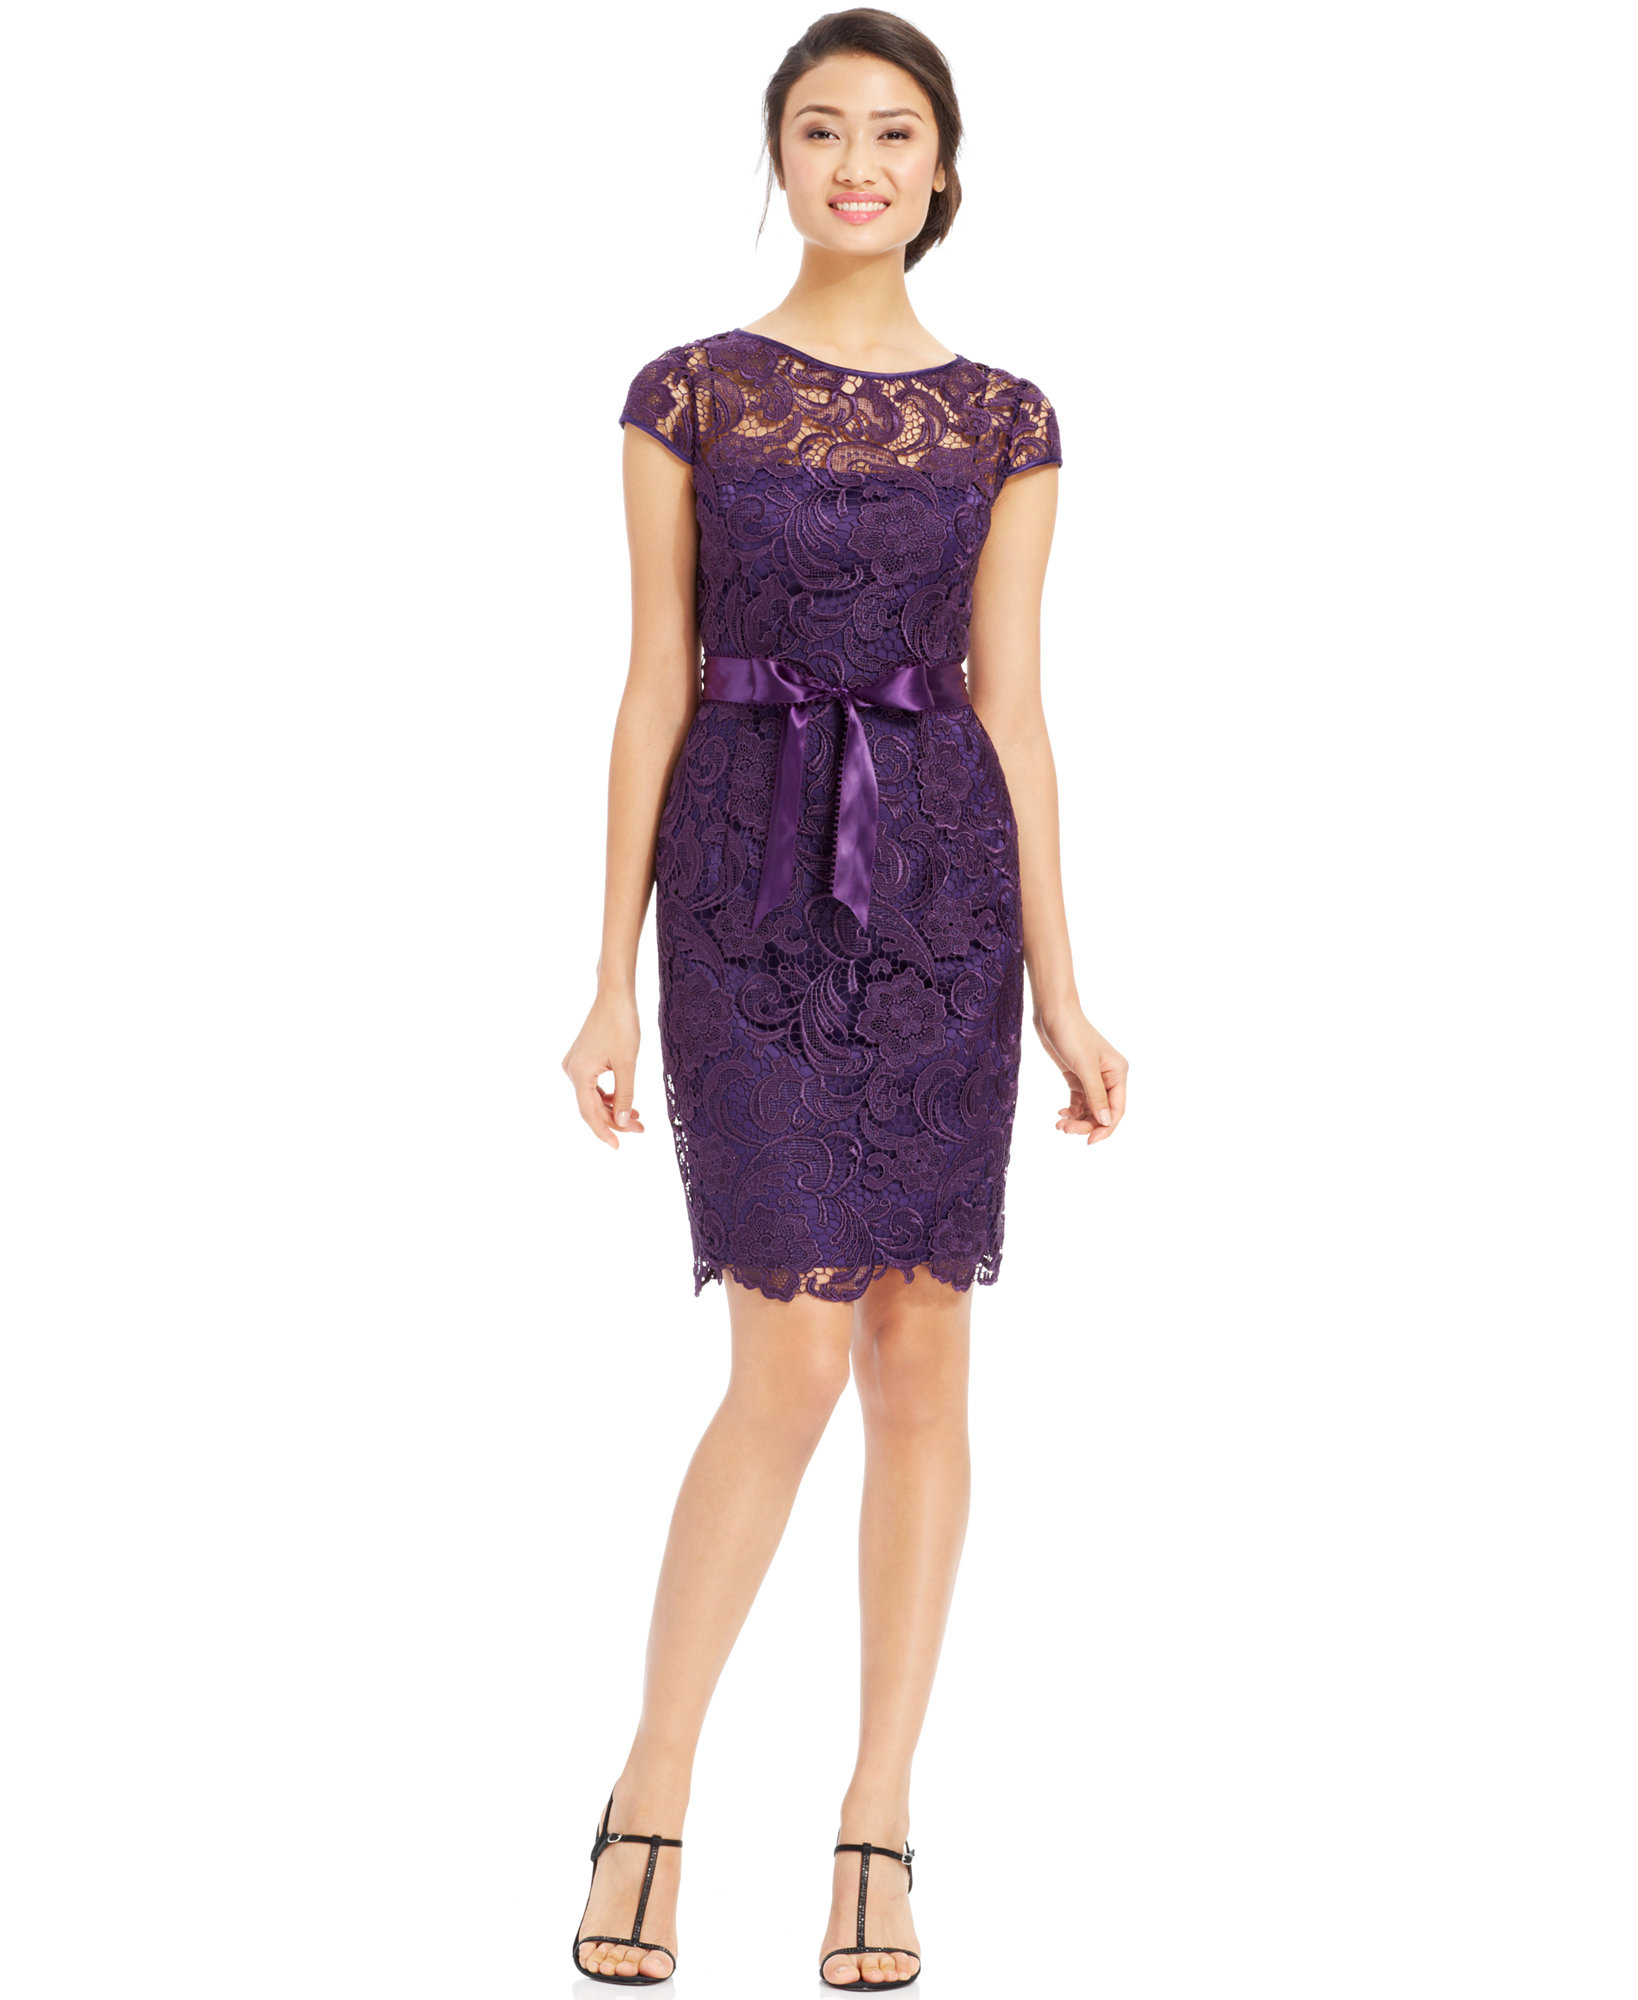 Adrianna Papell Amethyst CapSleeve Illusion Lace Sheath Dress 6  eBay